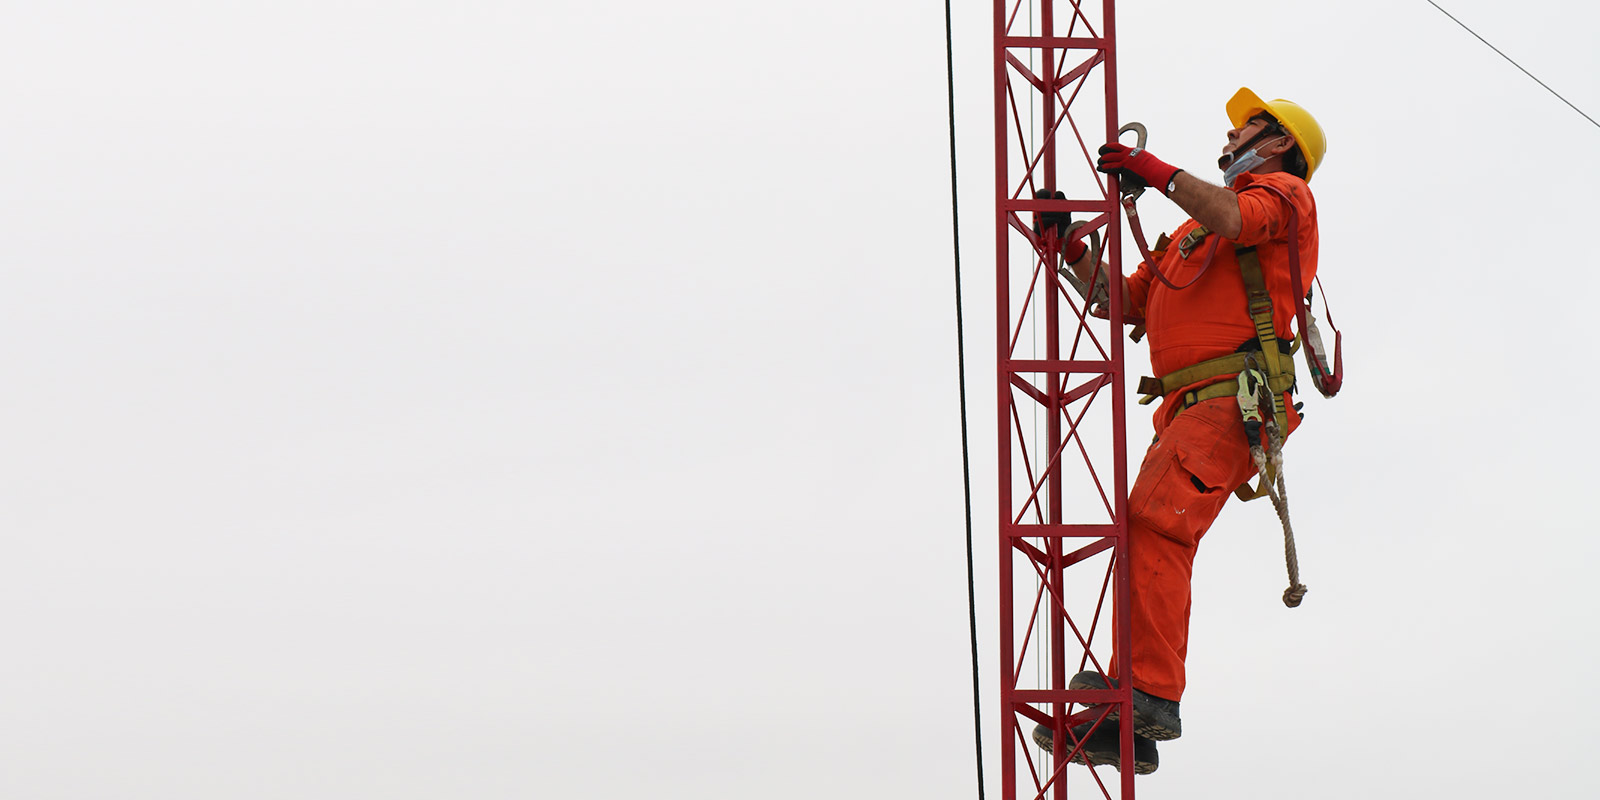 Donación de Sistema de Comunicación ante emergencias en altamar